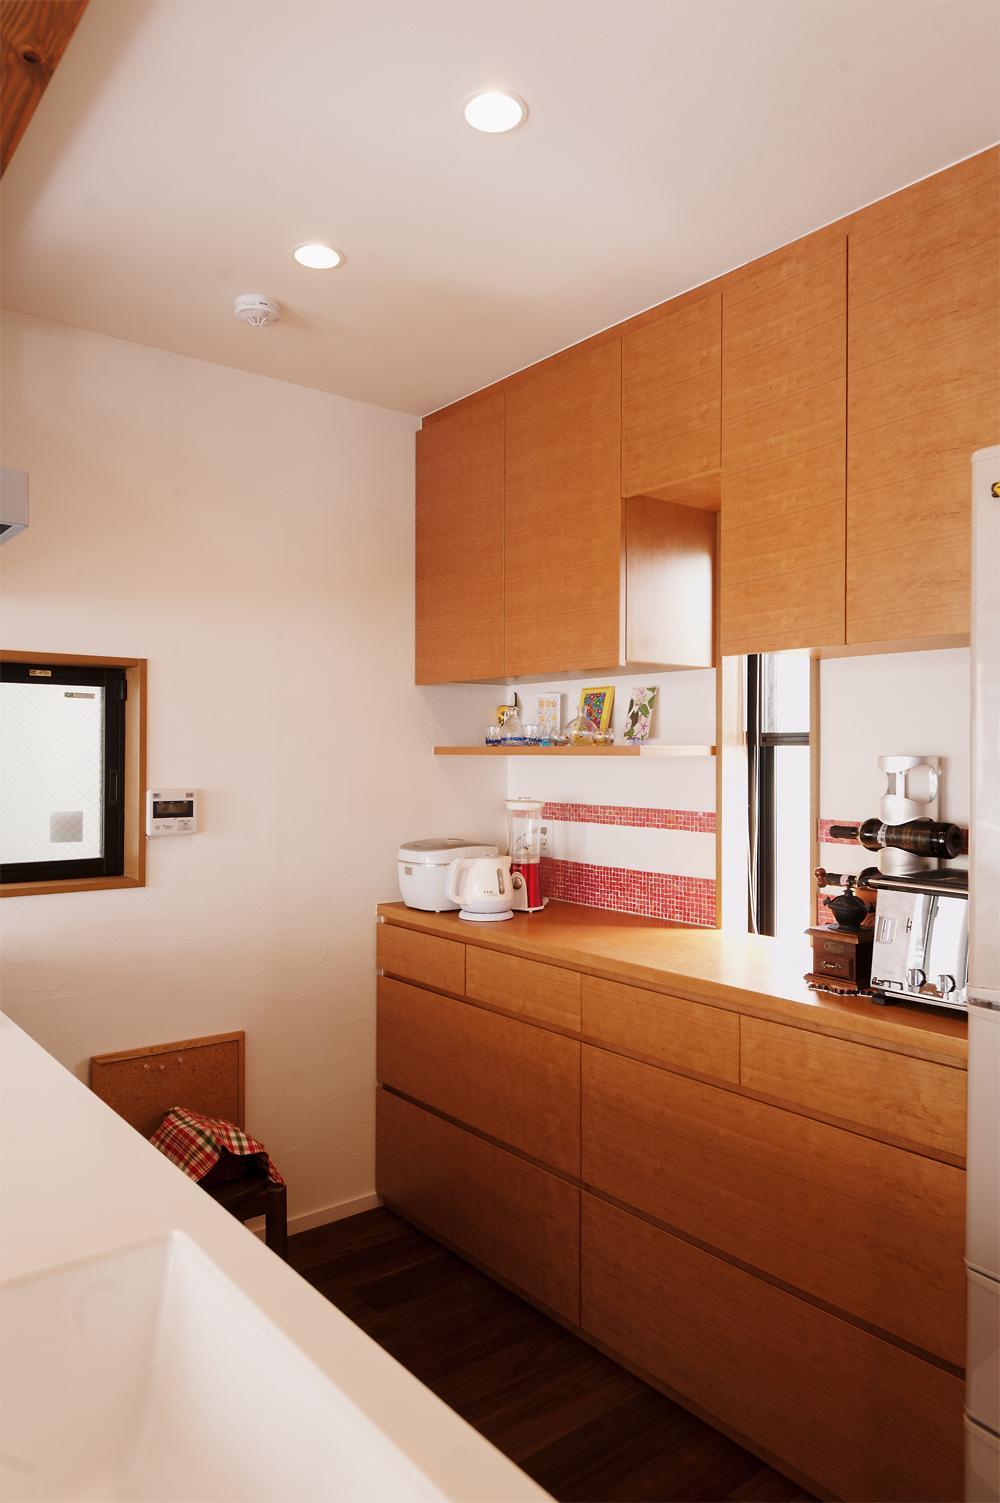 S邸・家族の笑顔がつながるオープンキッチンの部屋 キッチン背面の収納スペース